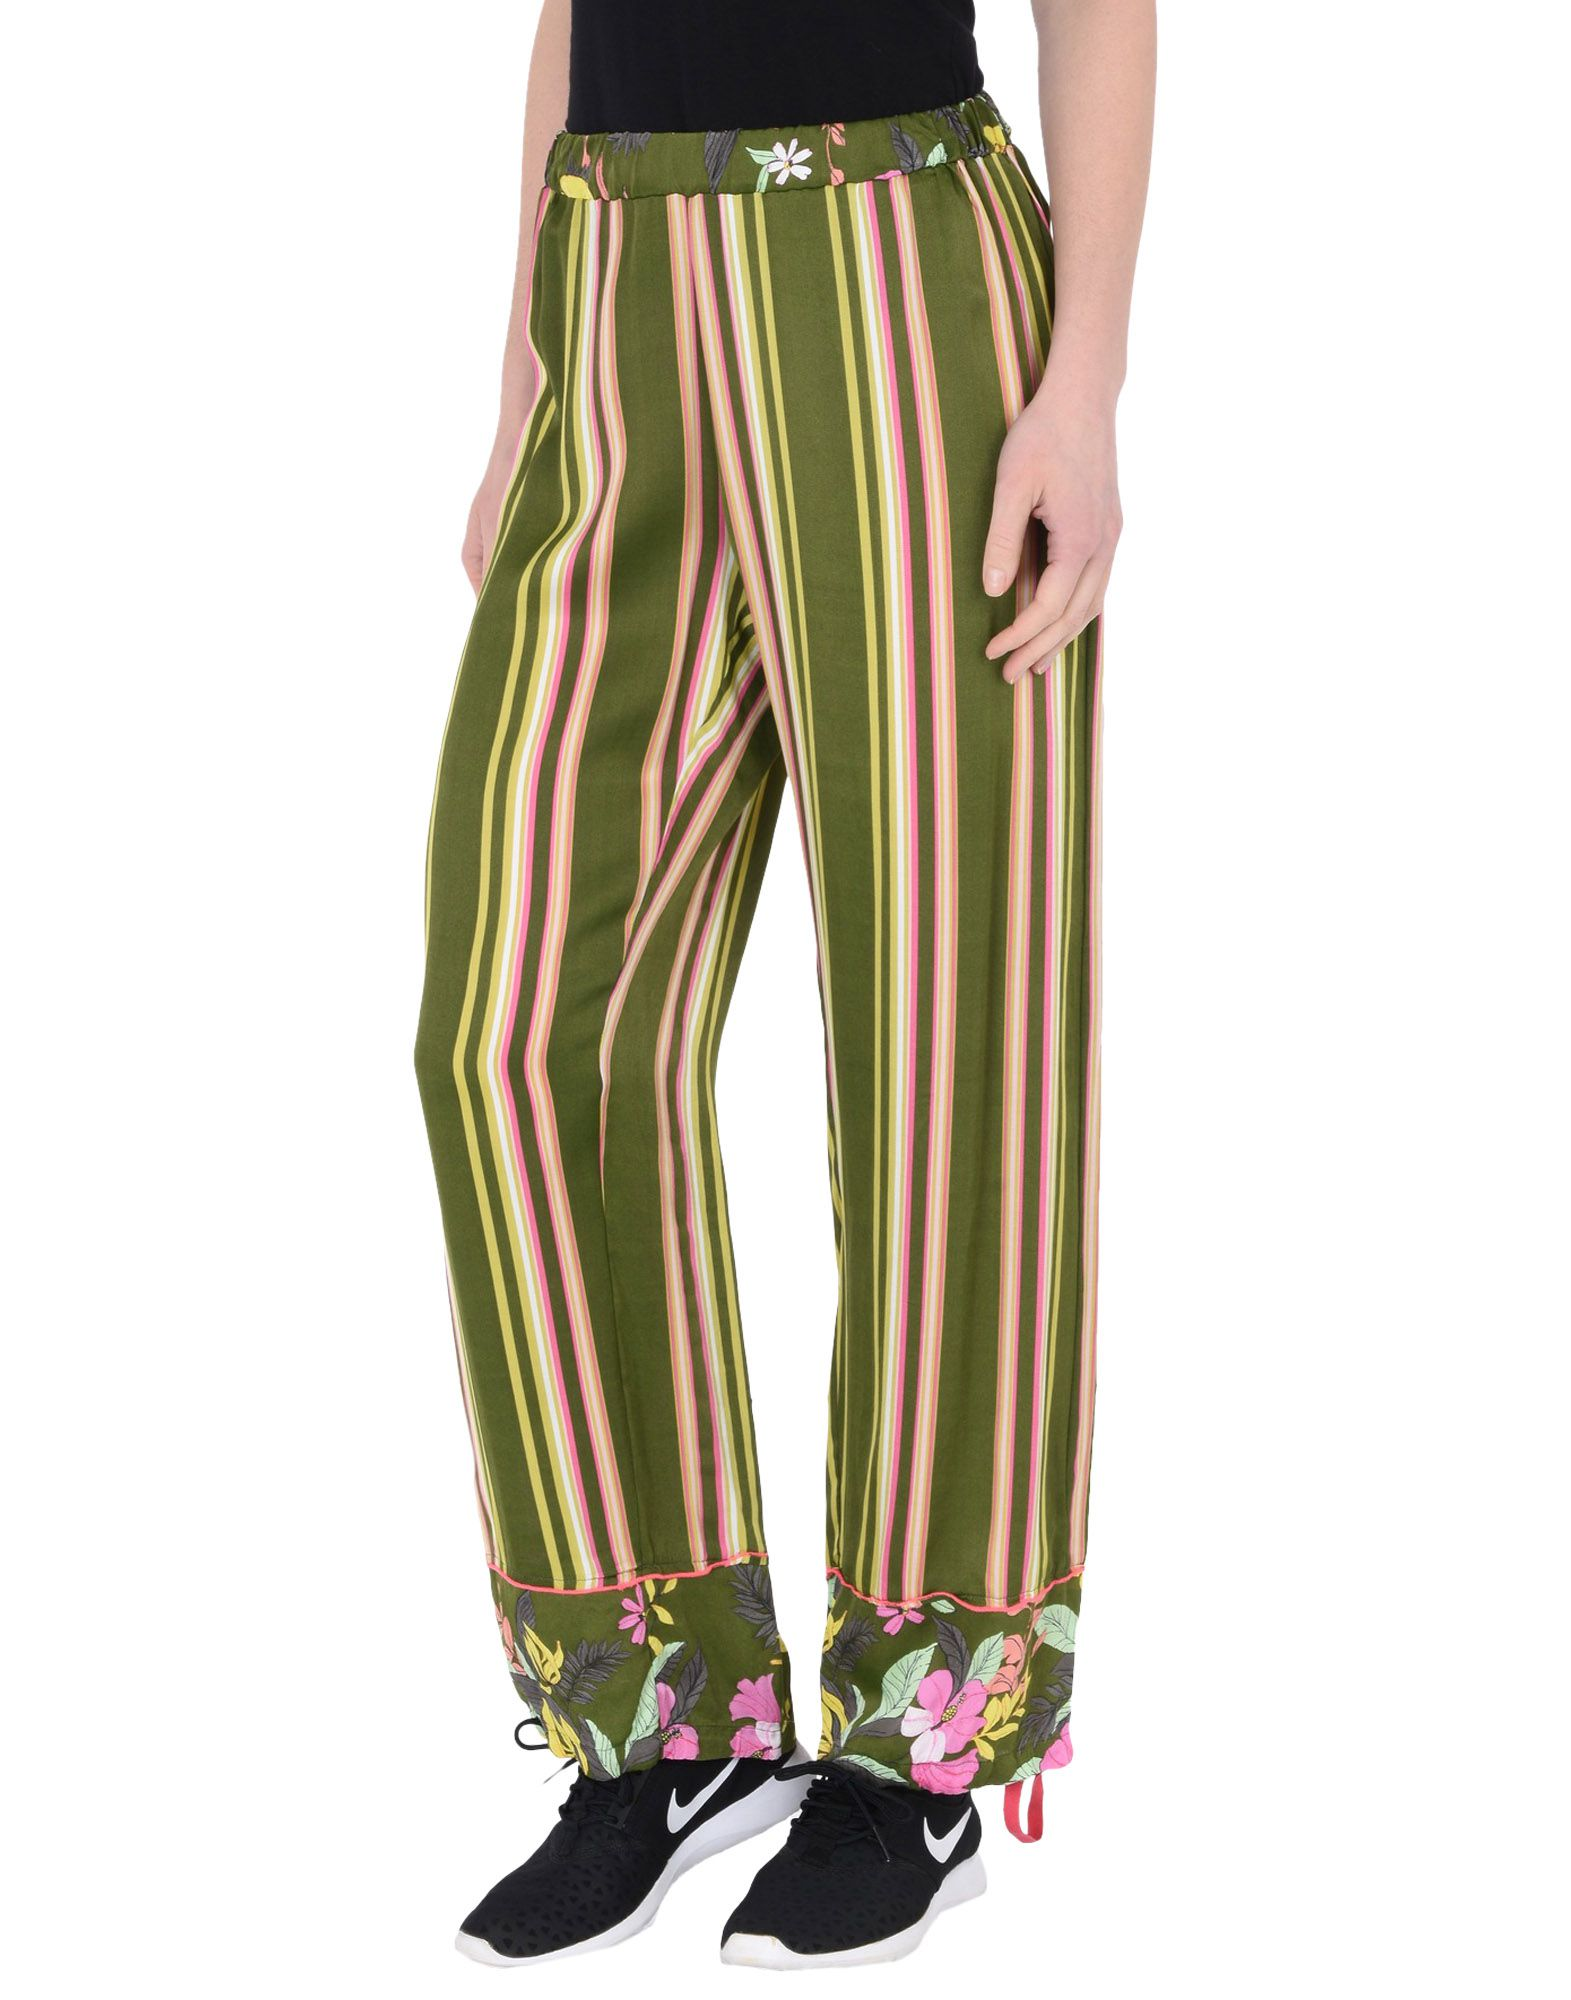 Pantalone Deha Wide Leg Printed Pants - Donna - Acquista online su ea2HHY9RS